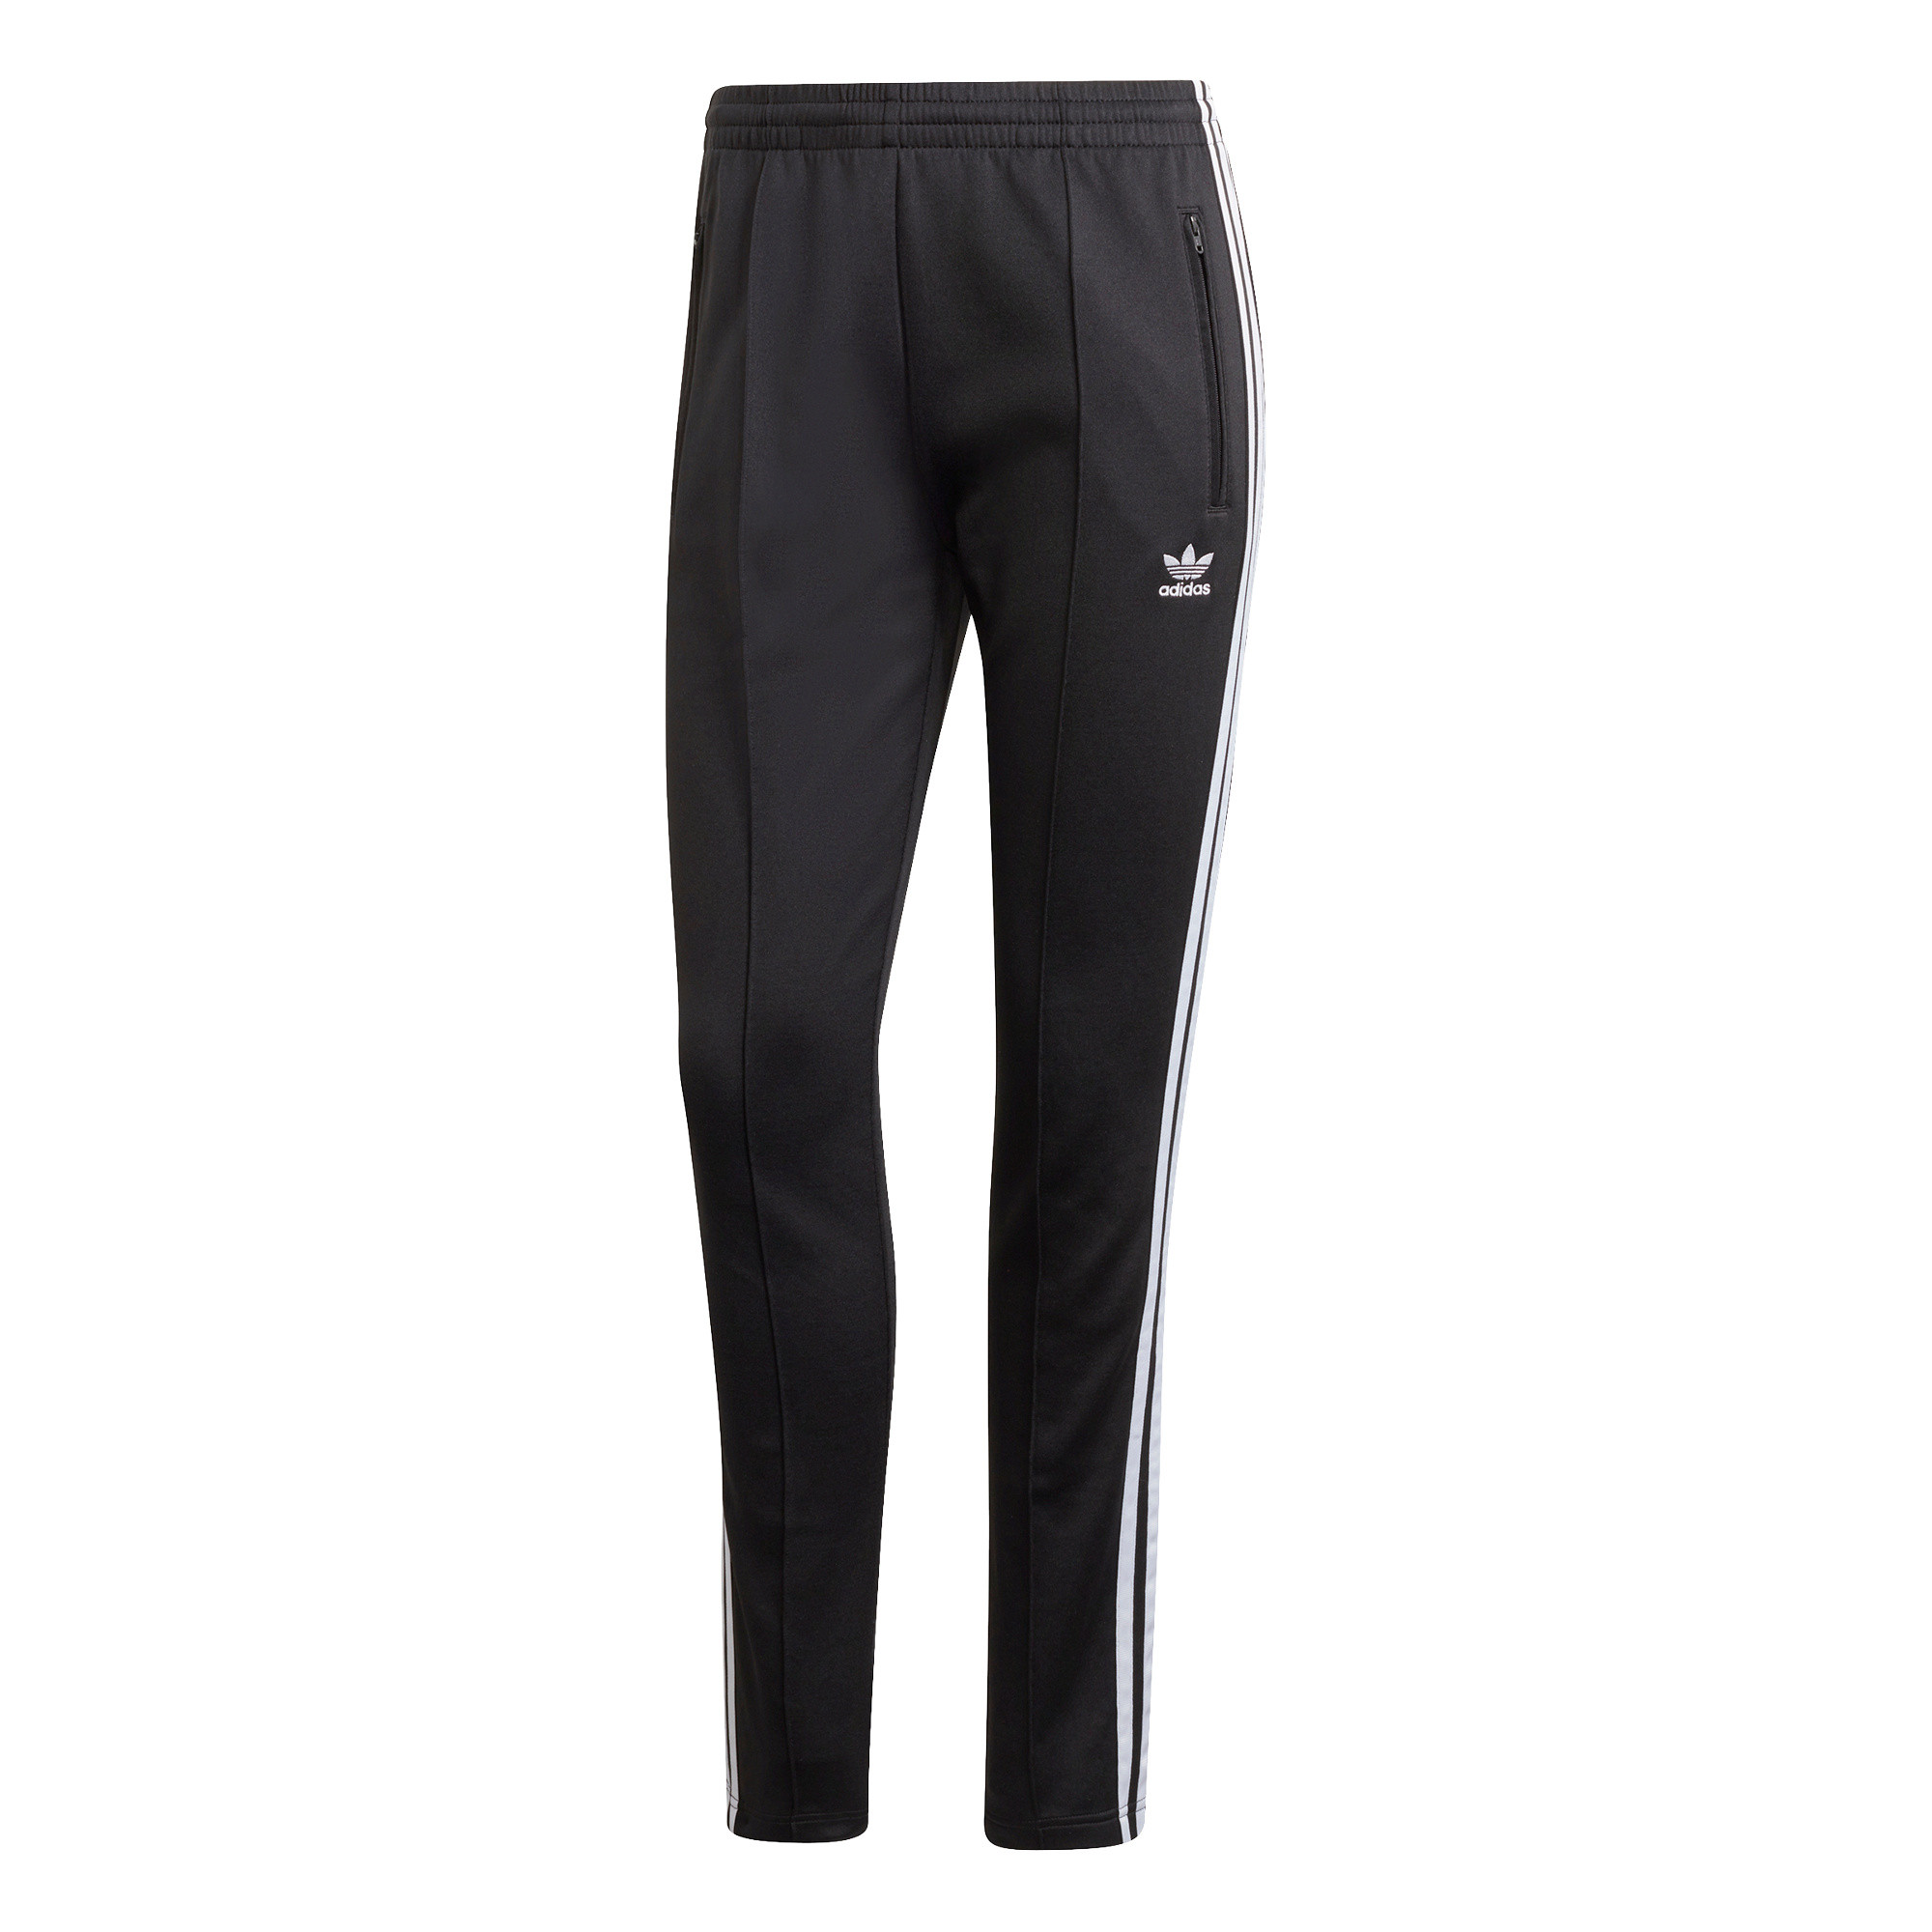 Pantaloni tuta Primeblue SST, Bianco/Nero, large image number 8